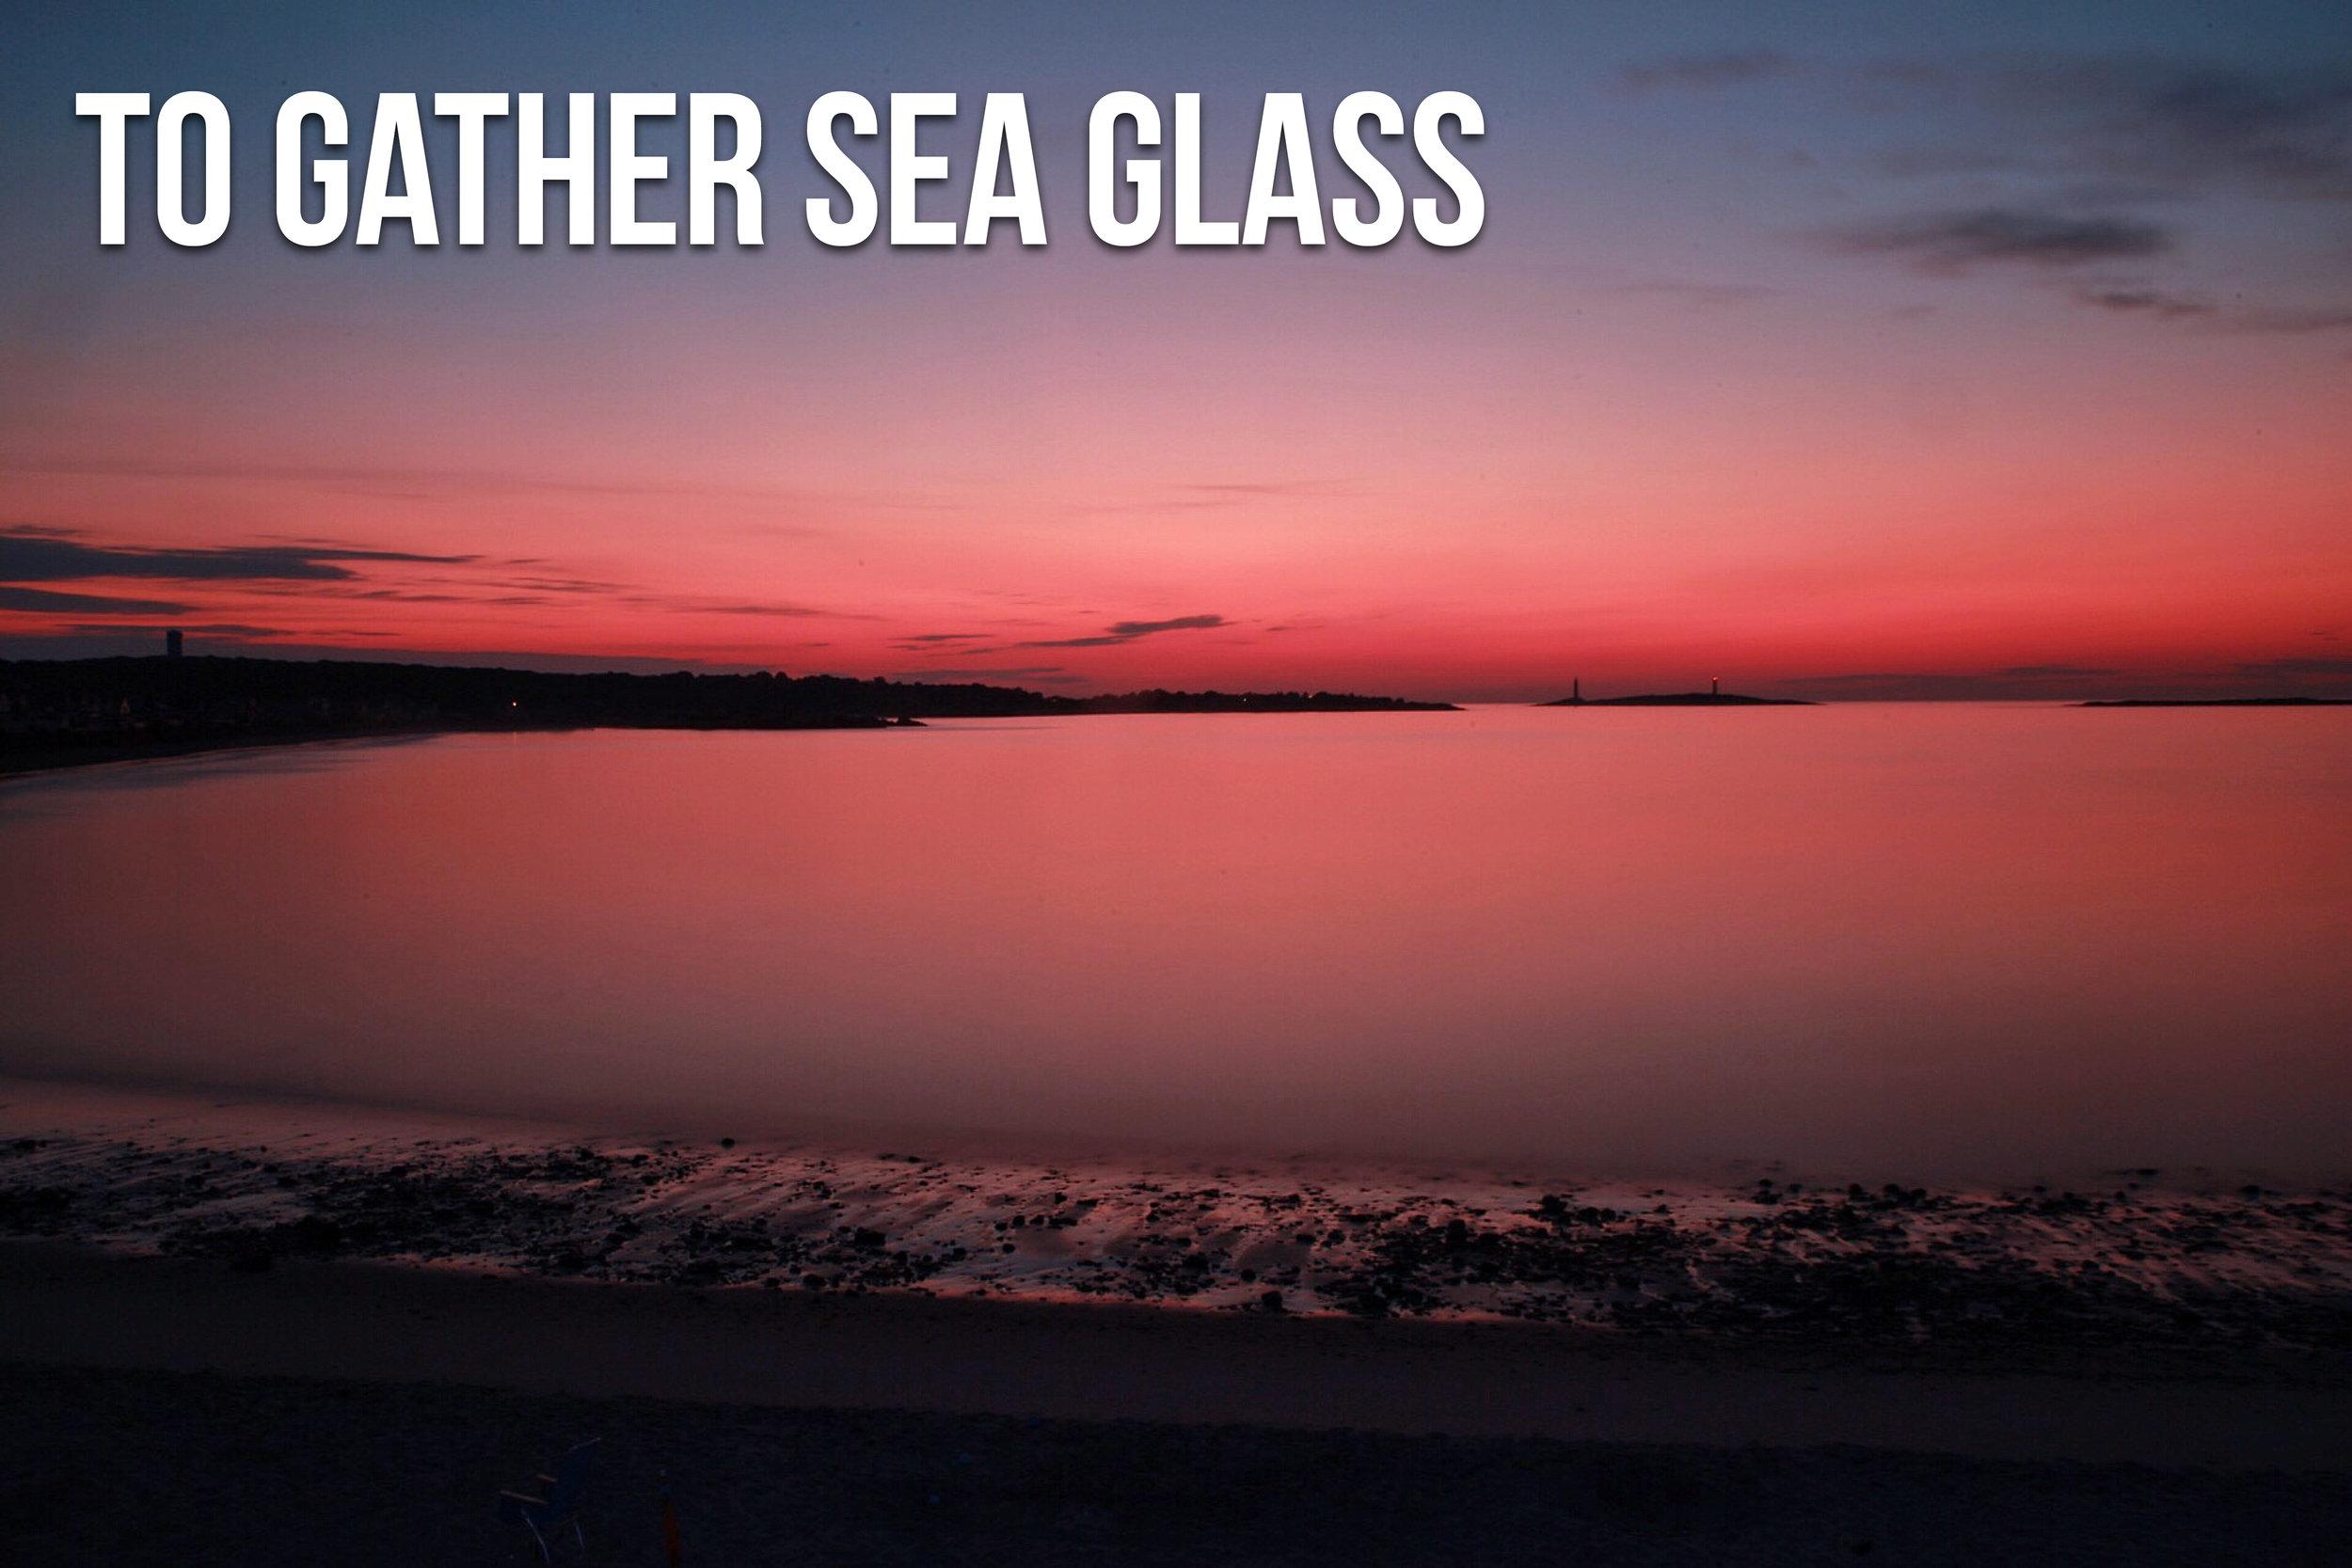 to-gather-sea-glass.jpg